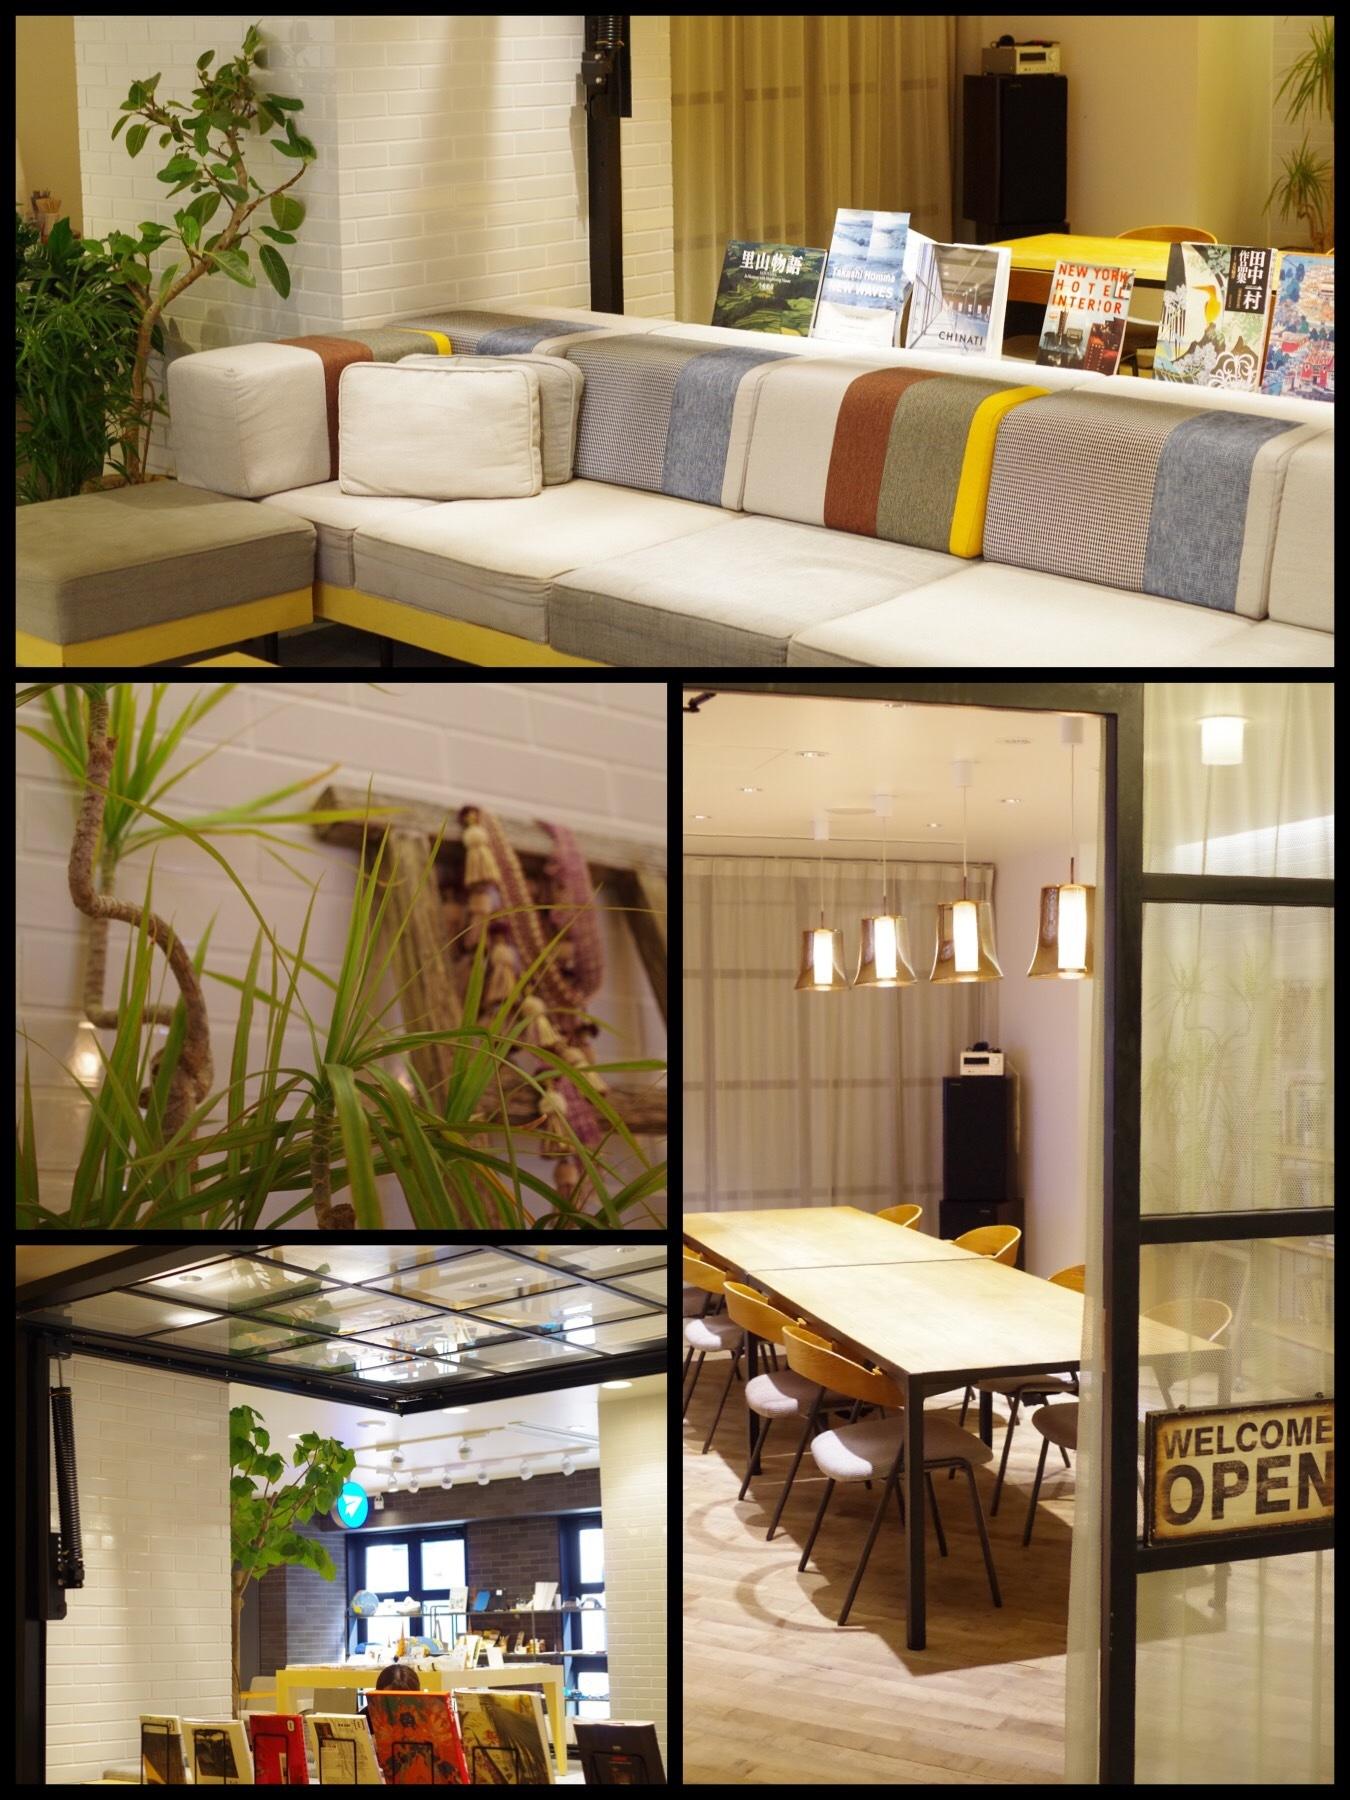 RAGOUT AND WHISKY HOUSE「ラグーアンドウイスキーハウス」ホテル エディット横濱